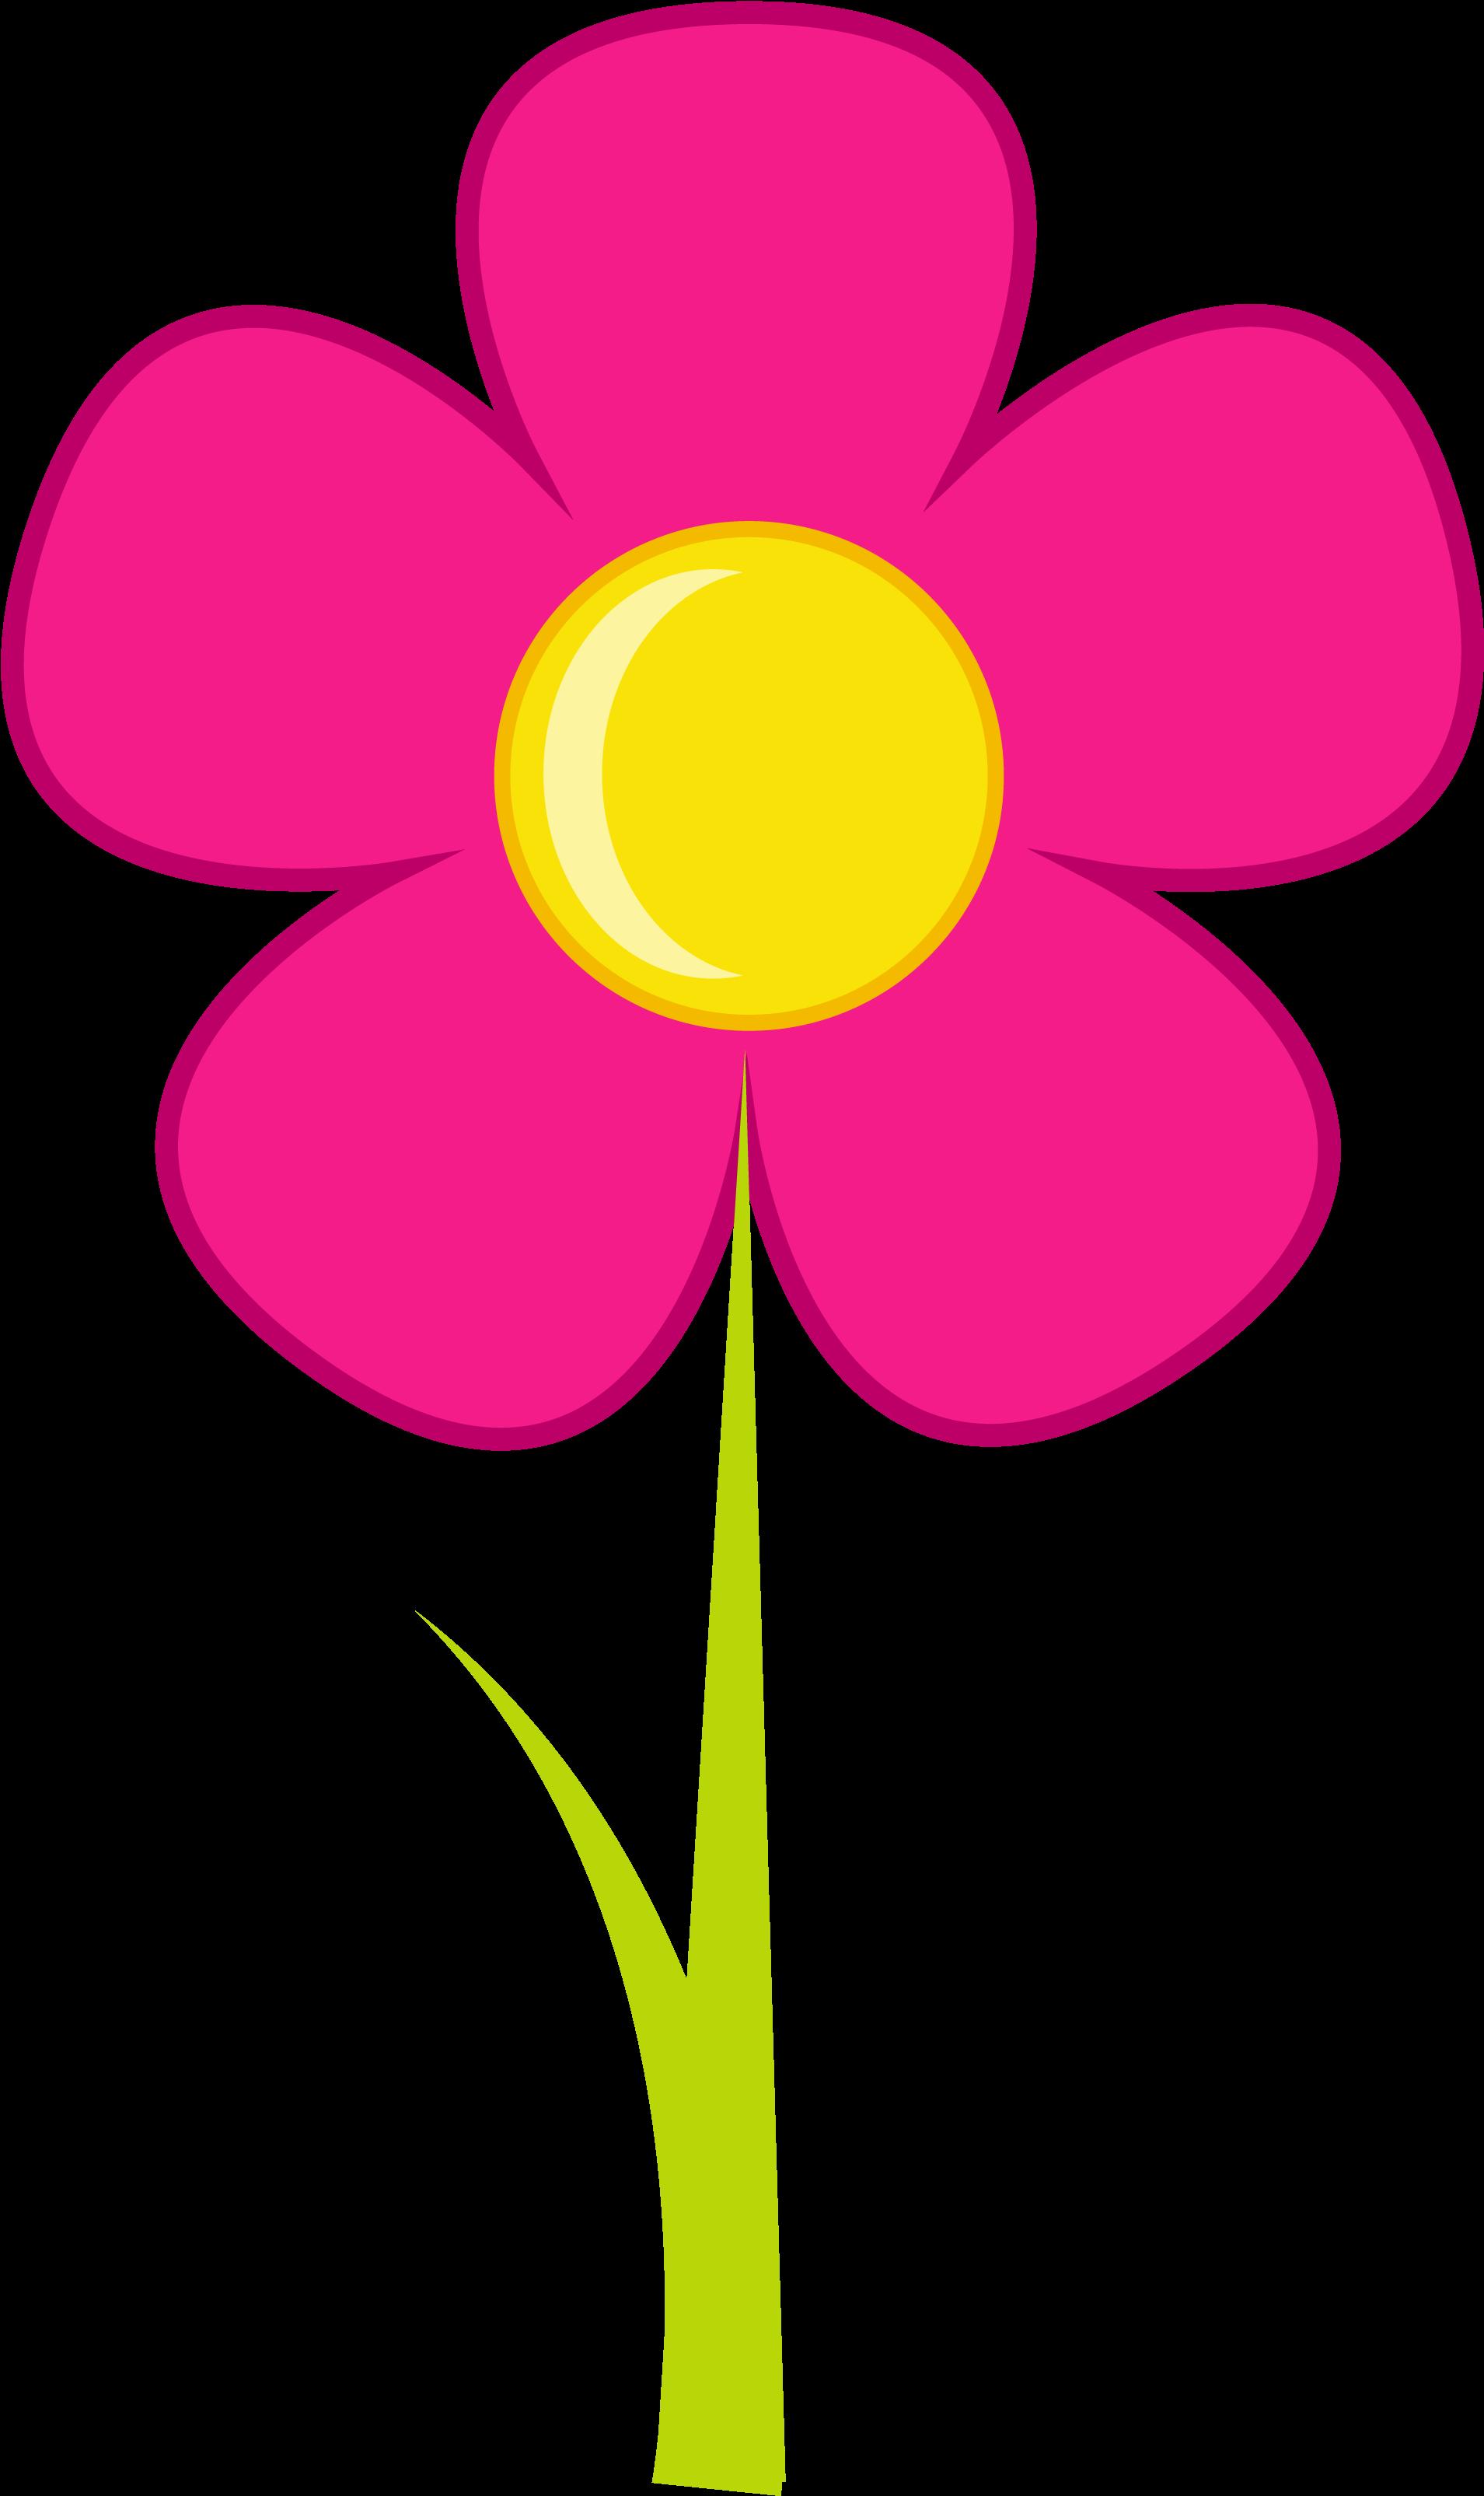 Mayflower clipart pretty flower. Purple transparent